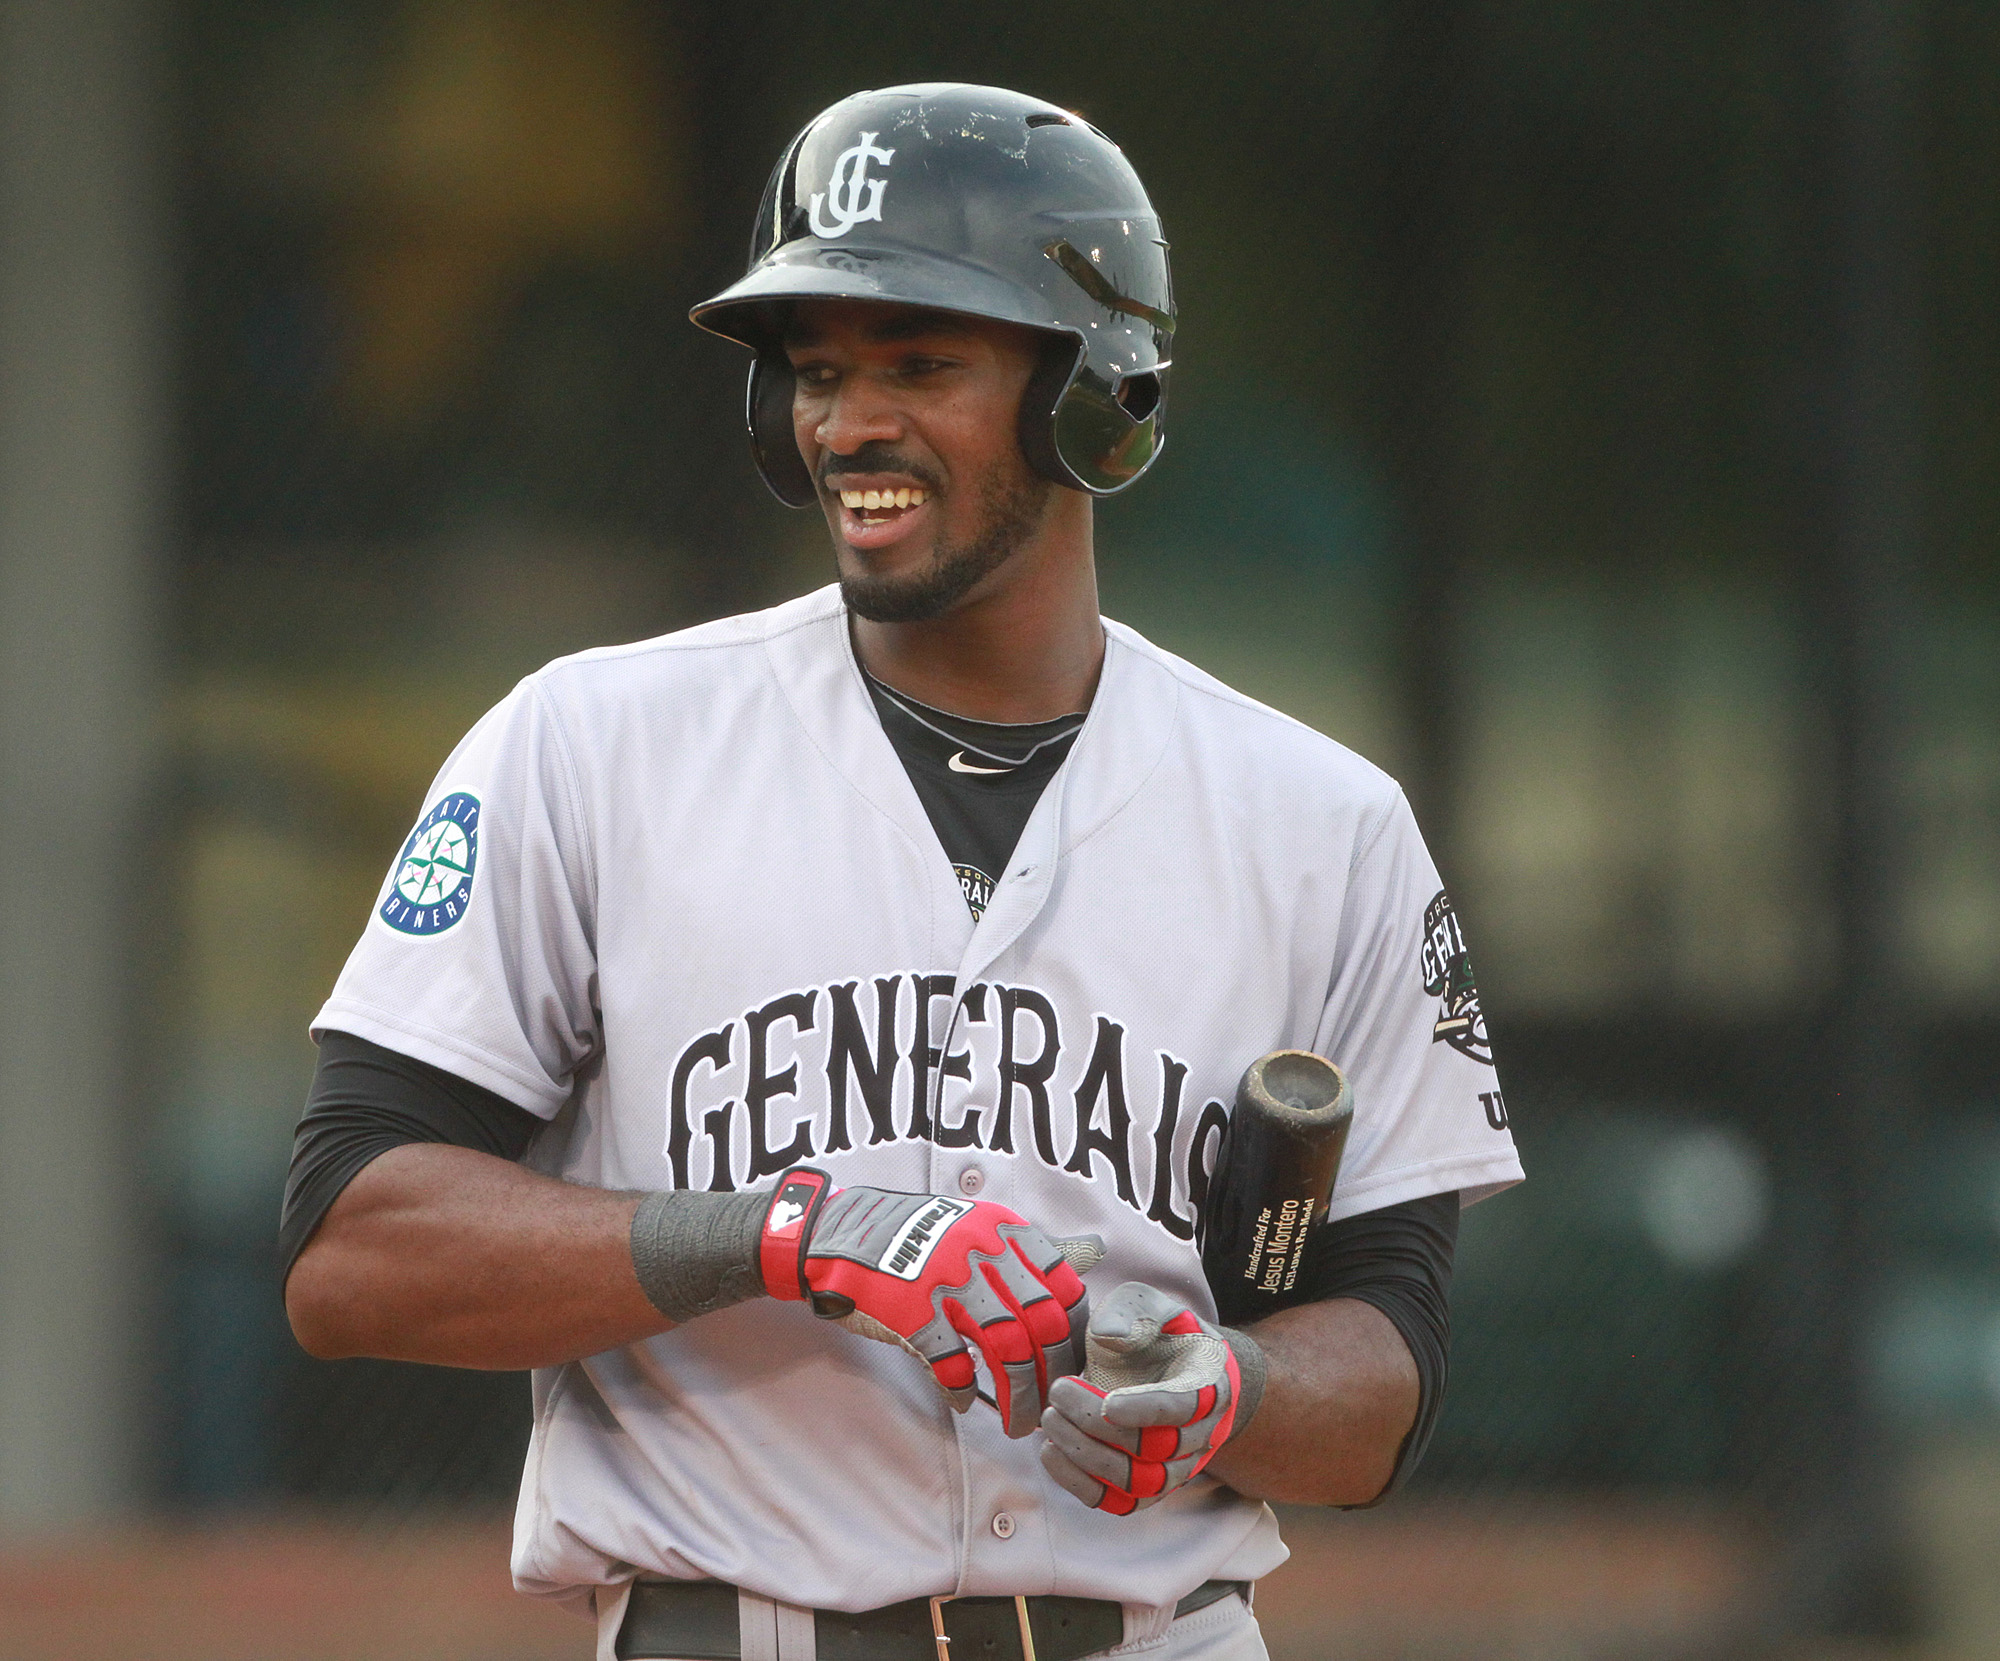 Jackson Generals 25-man Roster - baseballamerica.com